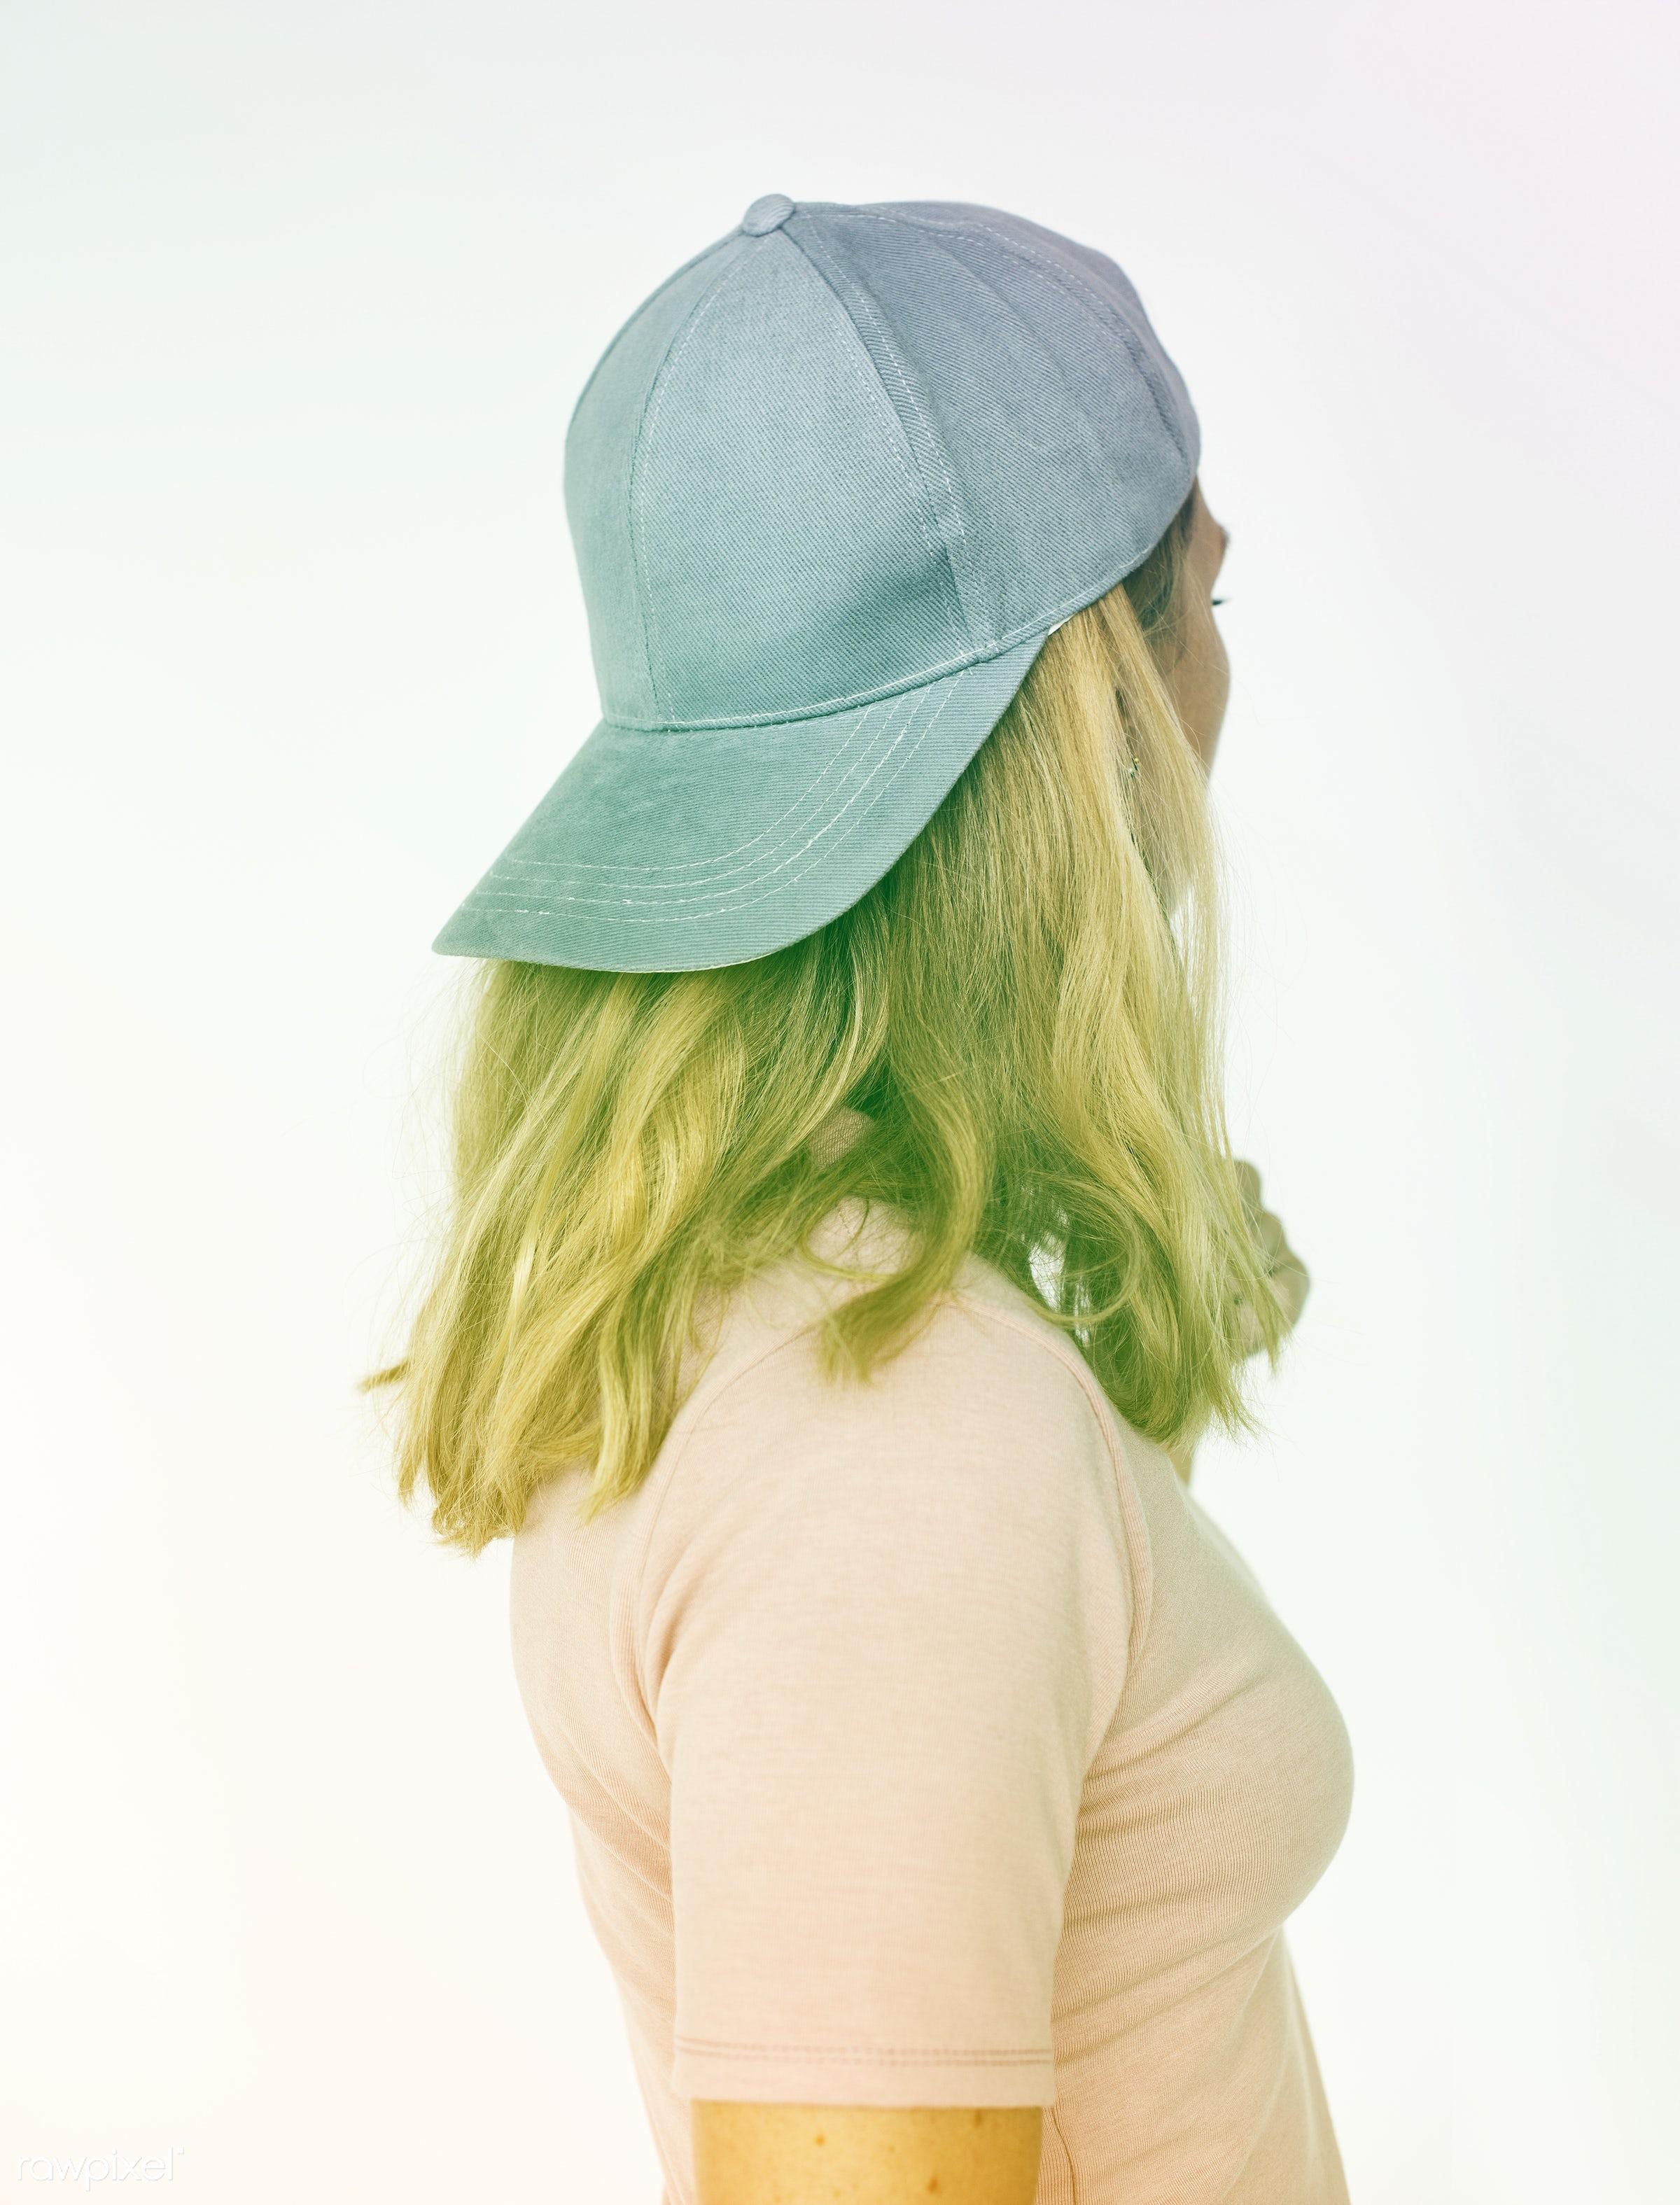 studio, person, boyish, people, caucasian, hat, woman, isolated, white, portrait, confident, filter, cap, beauty, cute,...